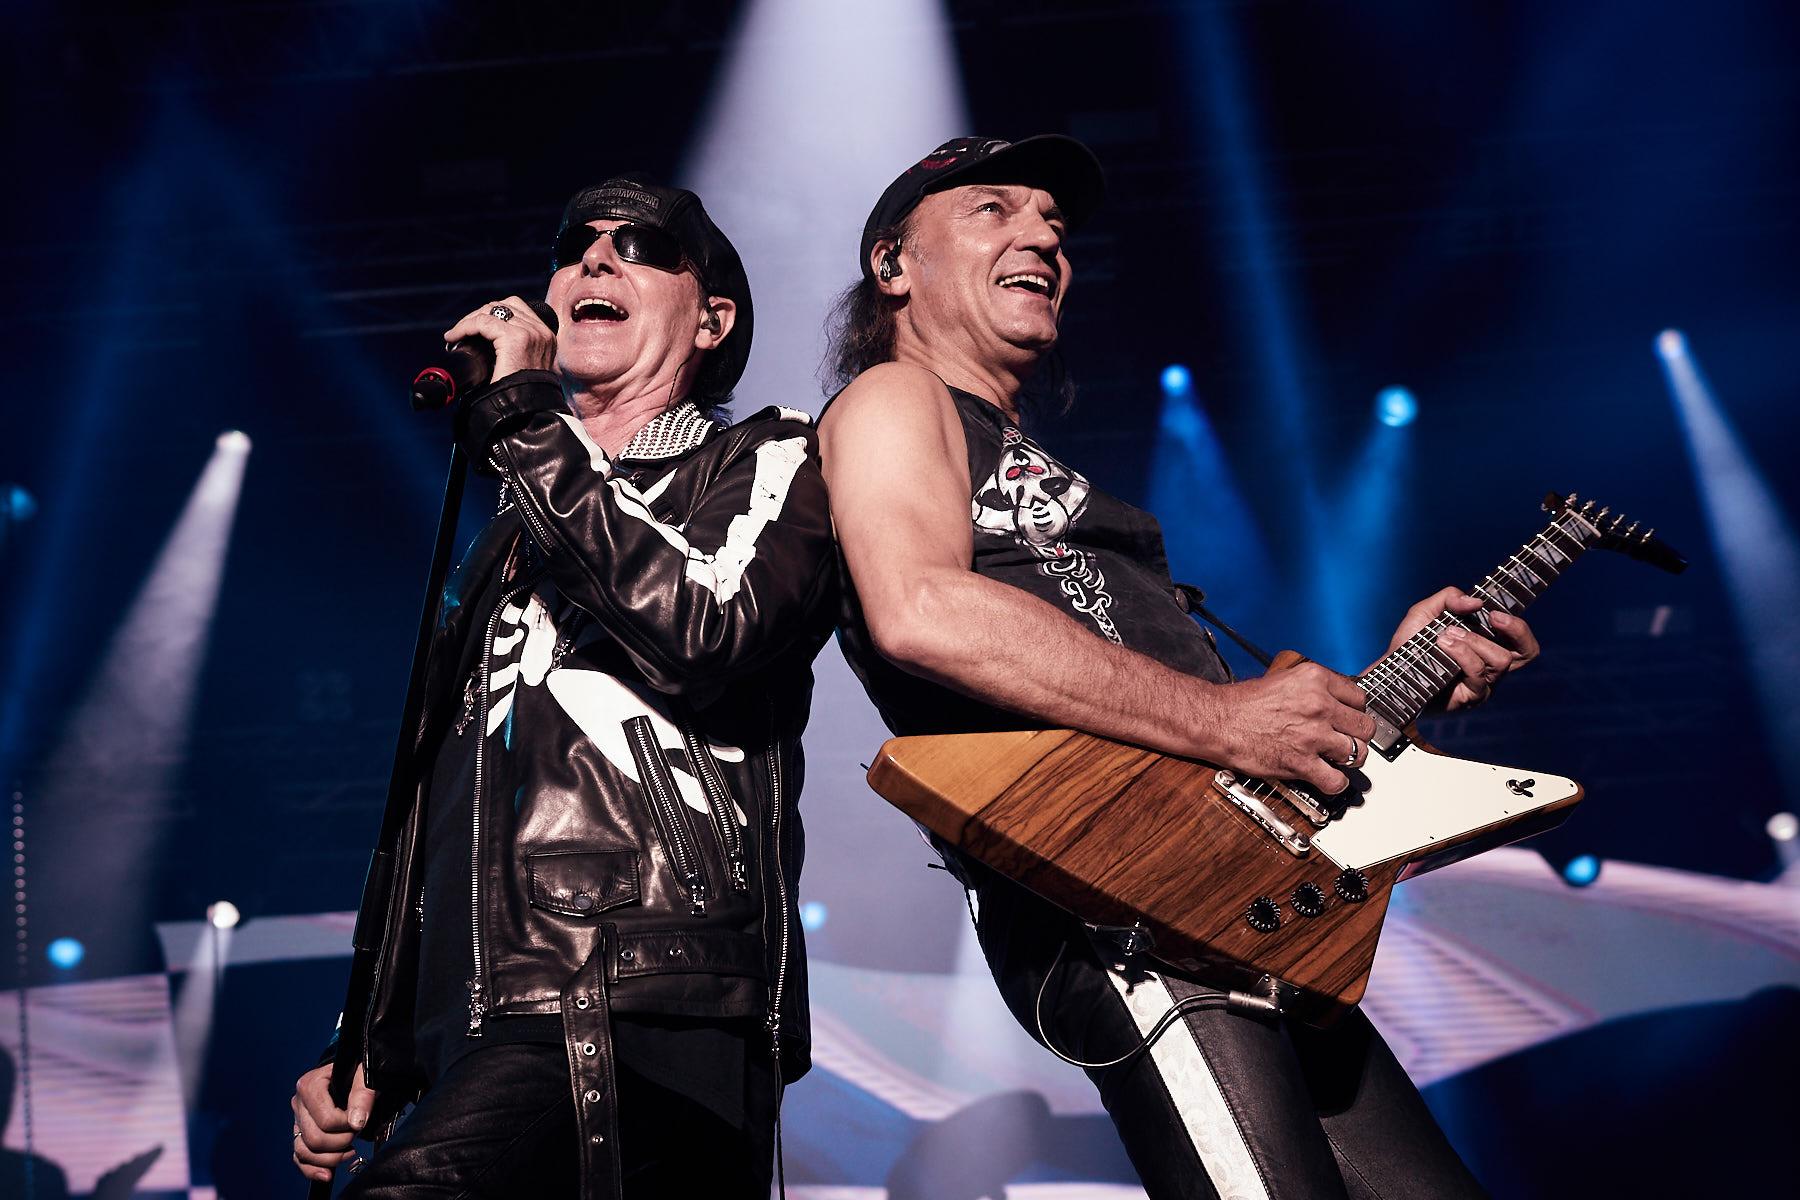 Scorpions & Κρατική Ορχήστρα Αθηνών